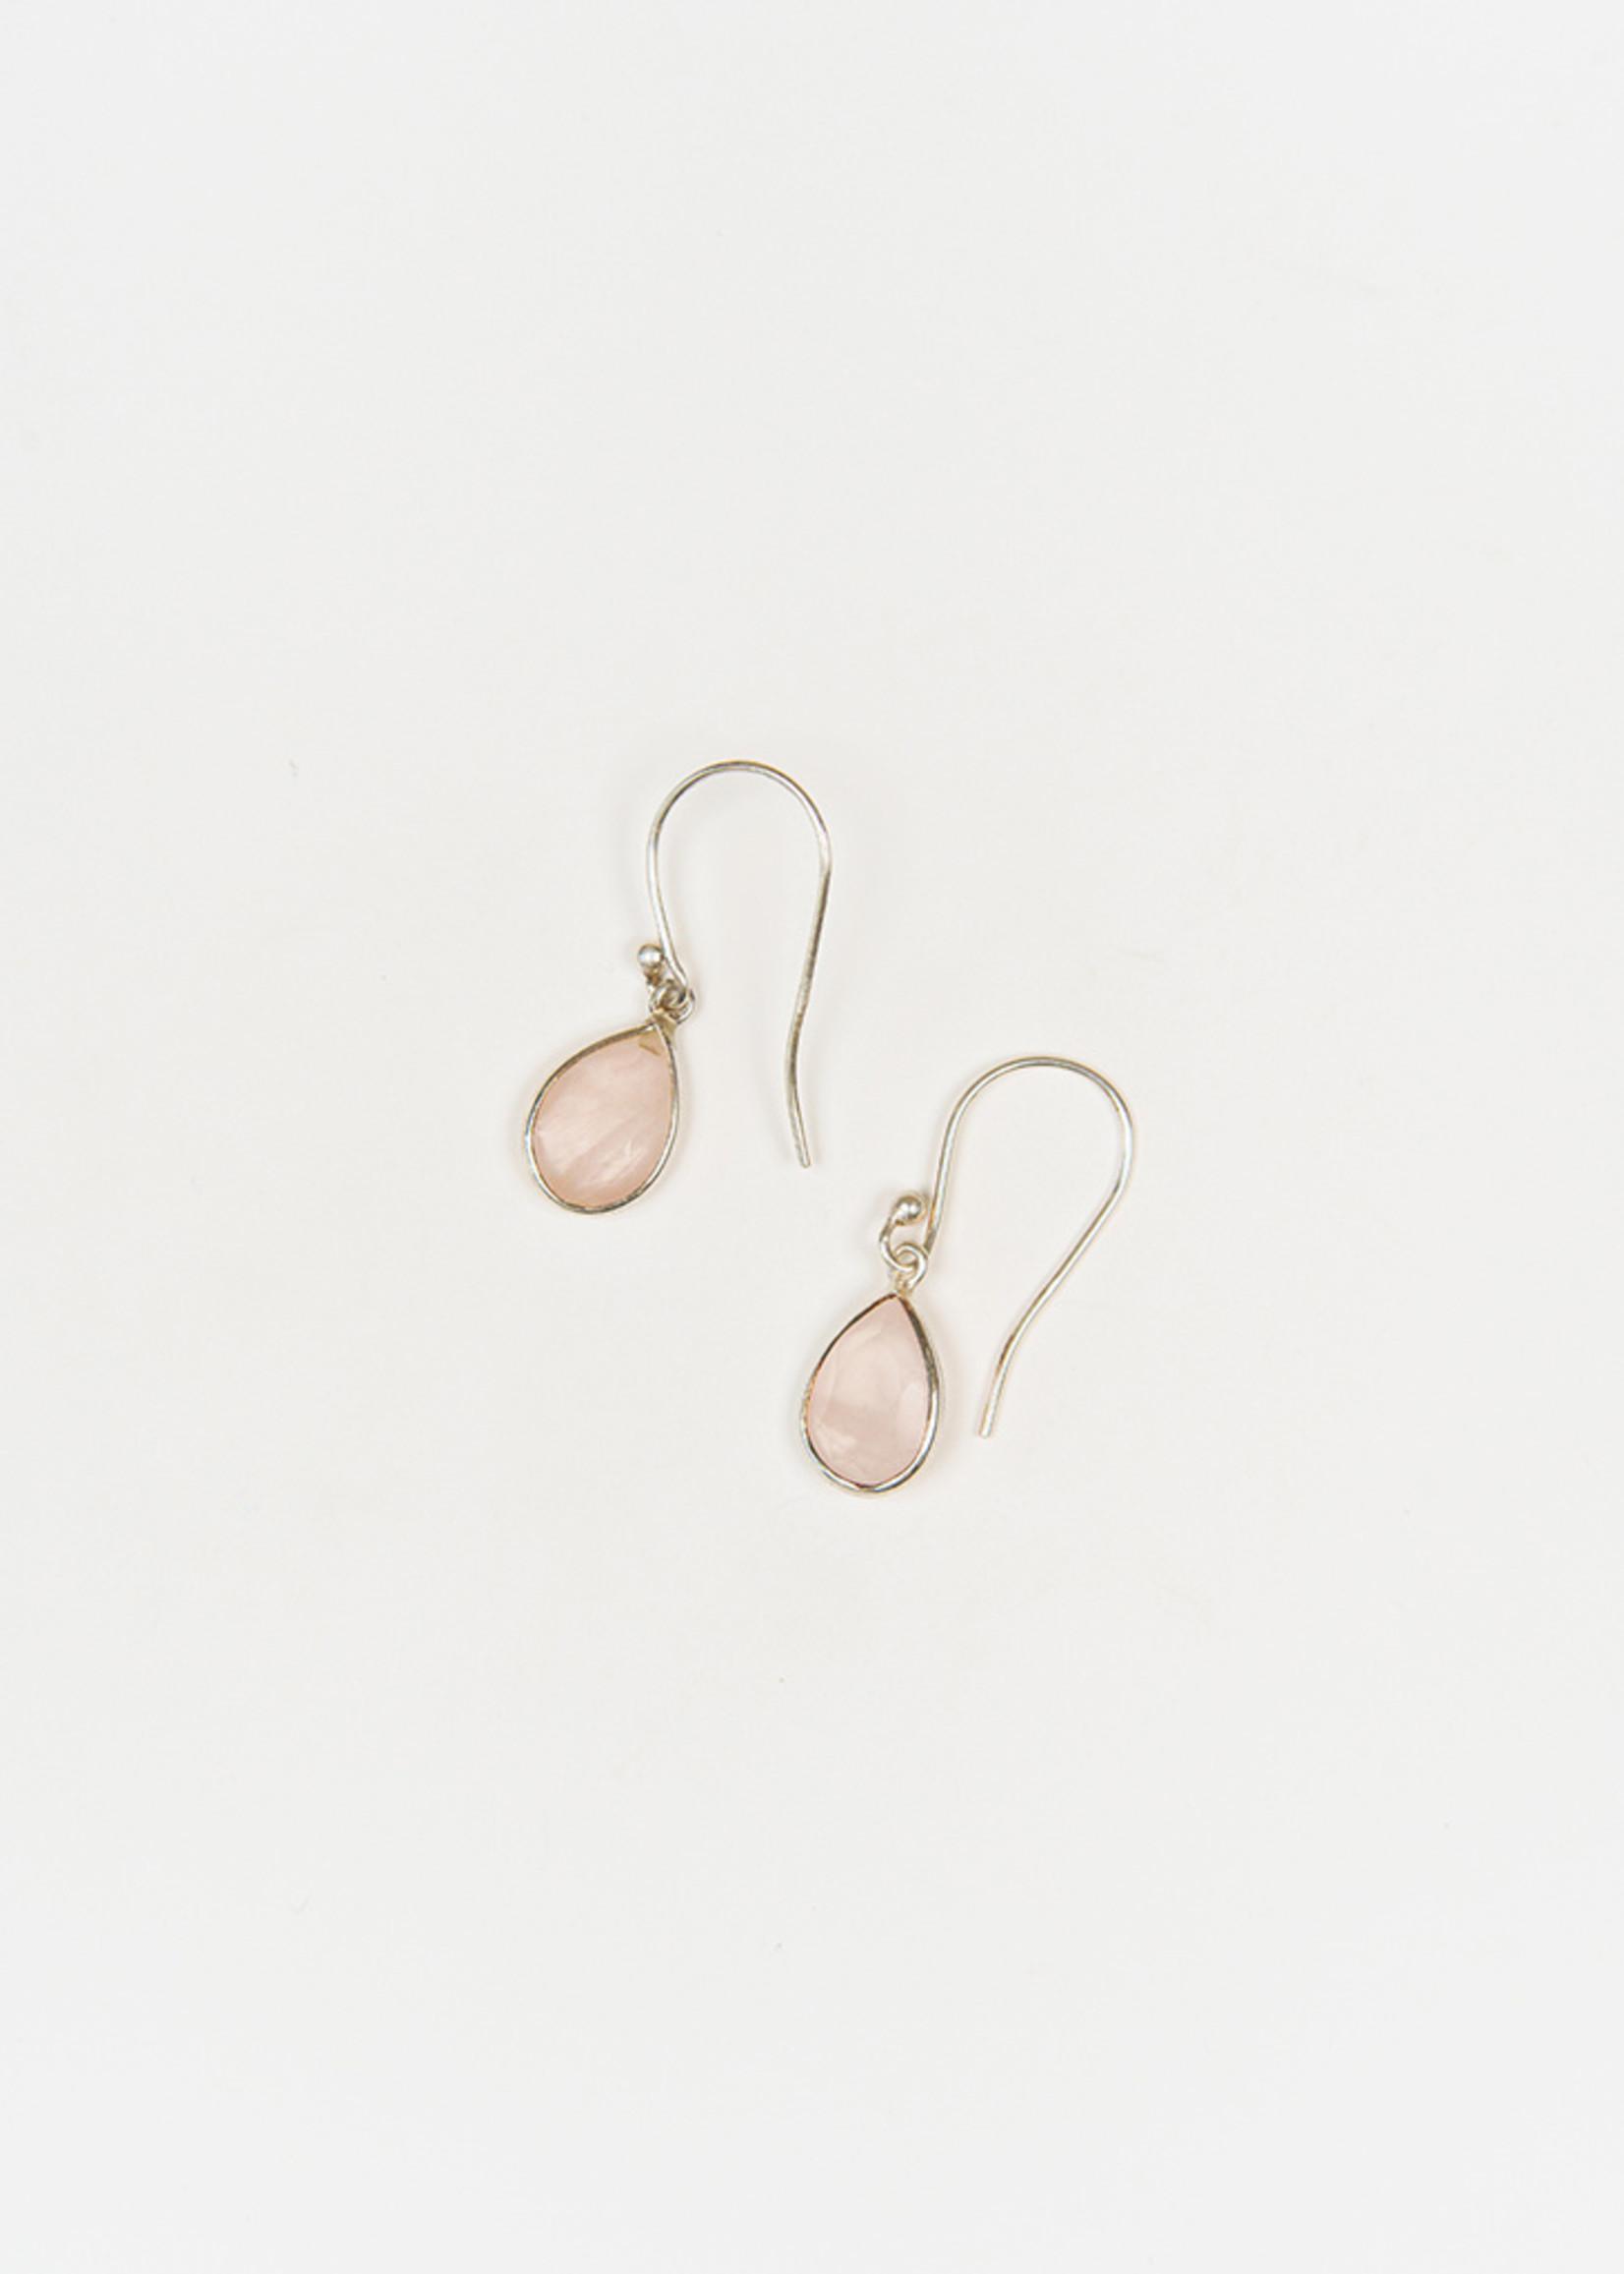 Raindrop Rose Quartz Earrings